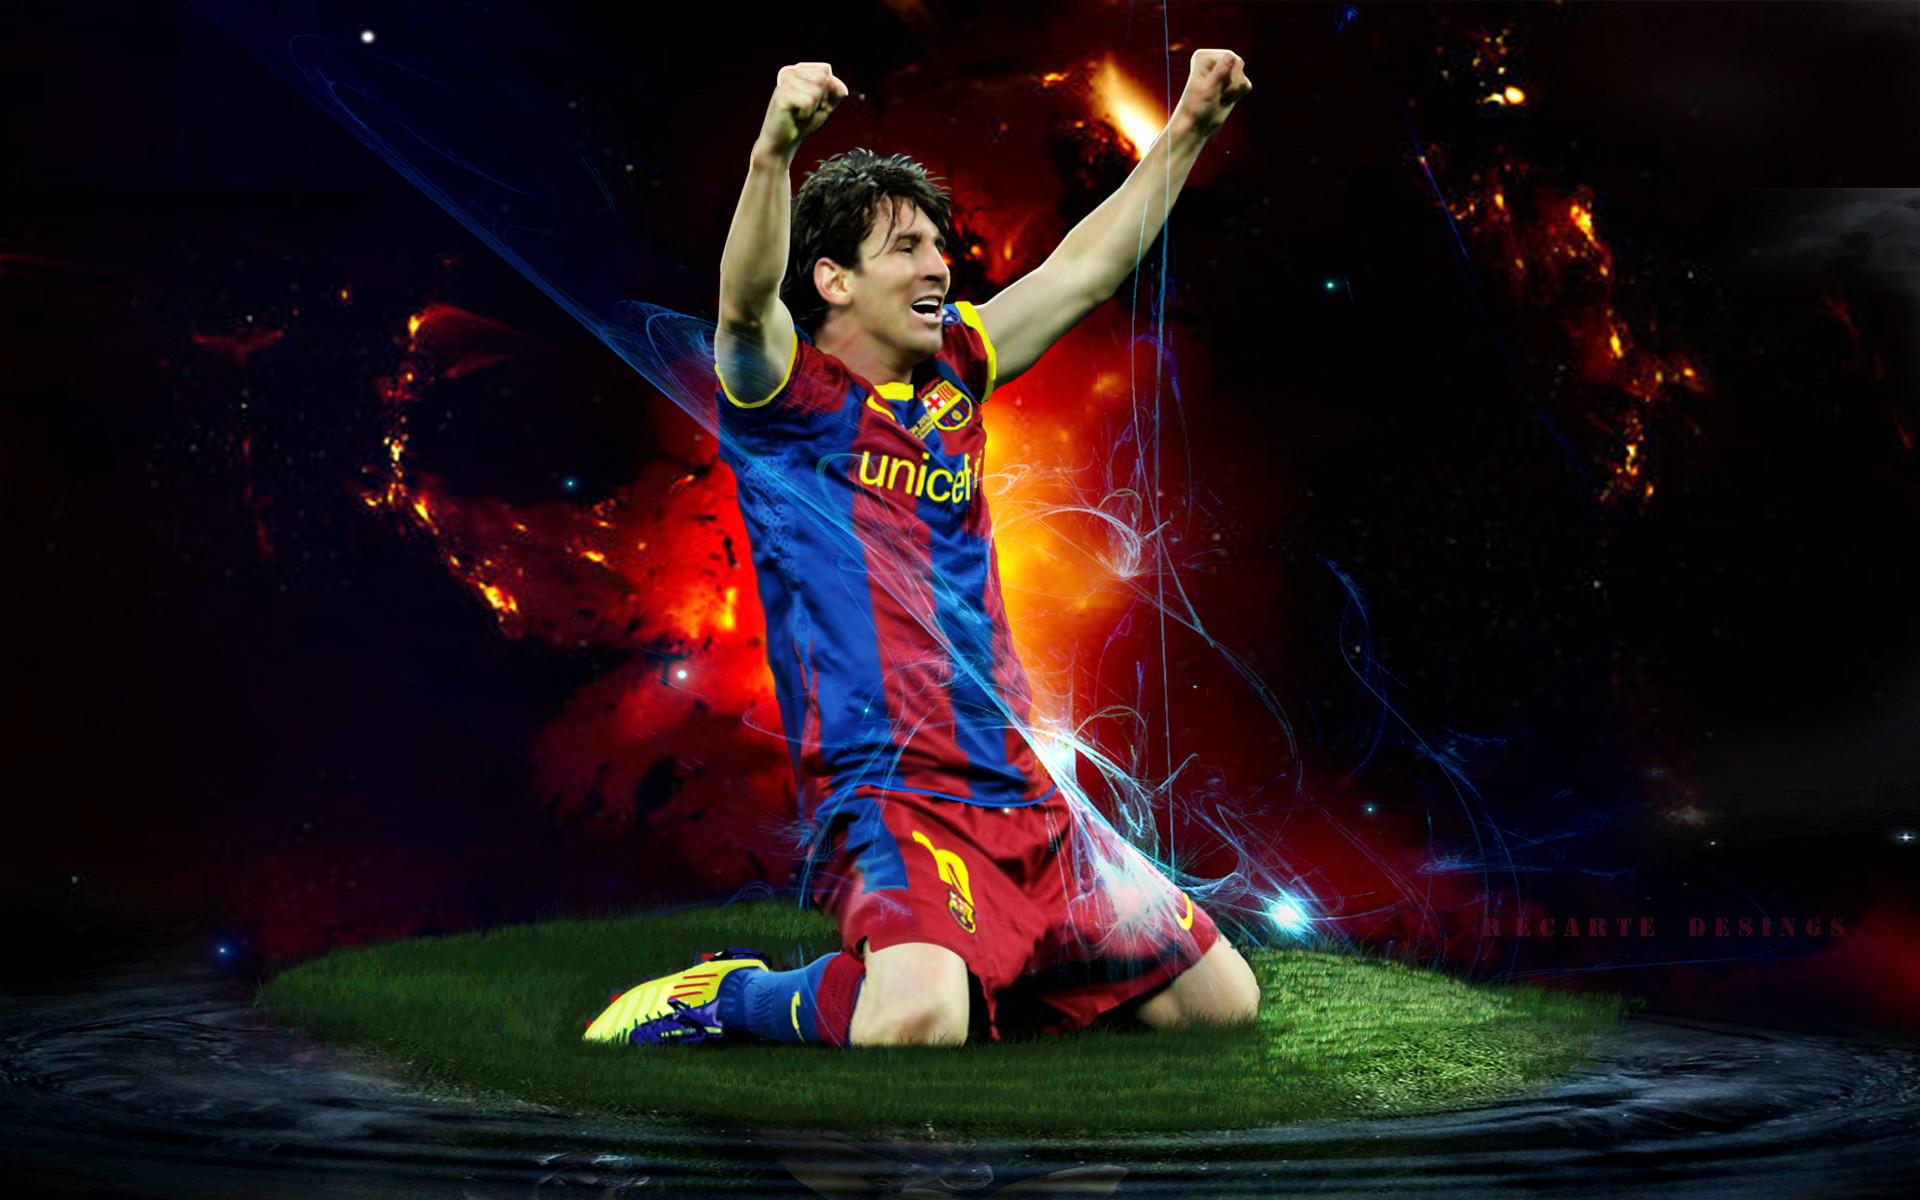 Lionel Messi Full Hd Desktop Wallpaper Hd Wallpapers Images 1920x1200